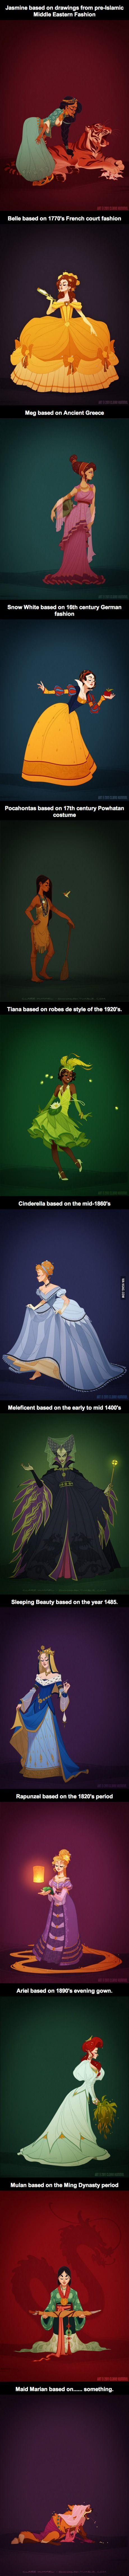 Disturbing or Strange Disney Images...